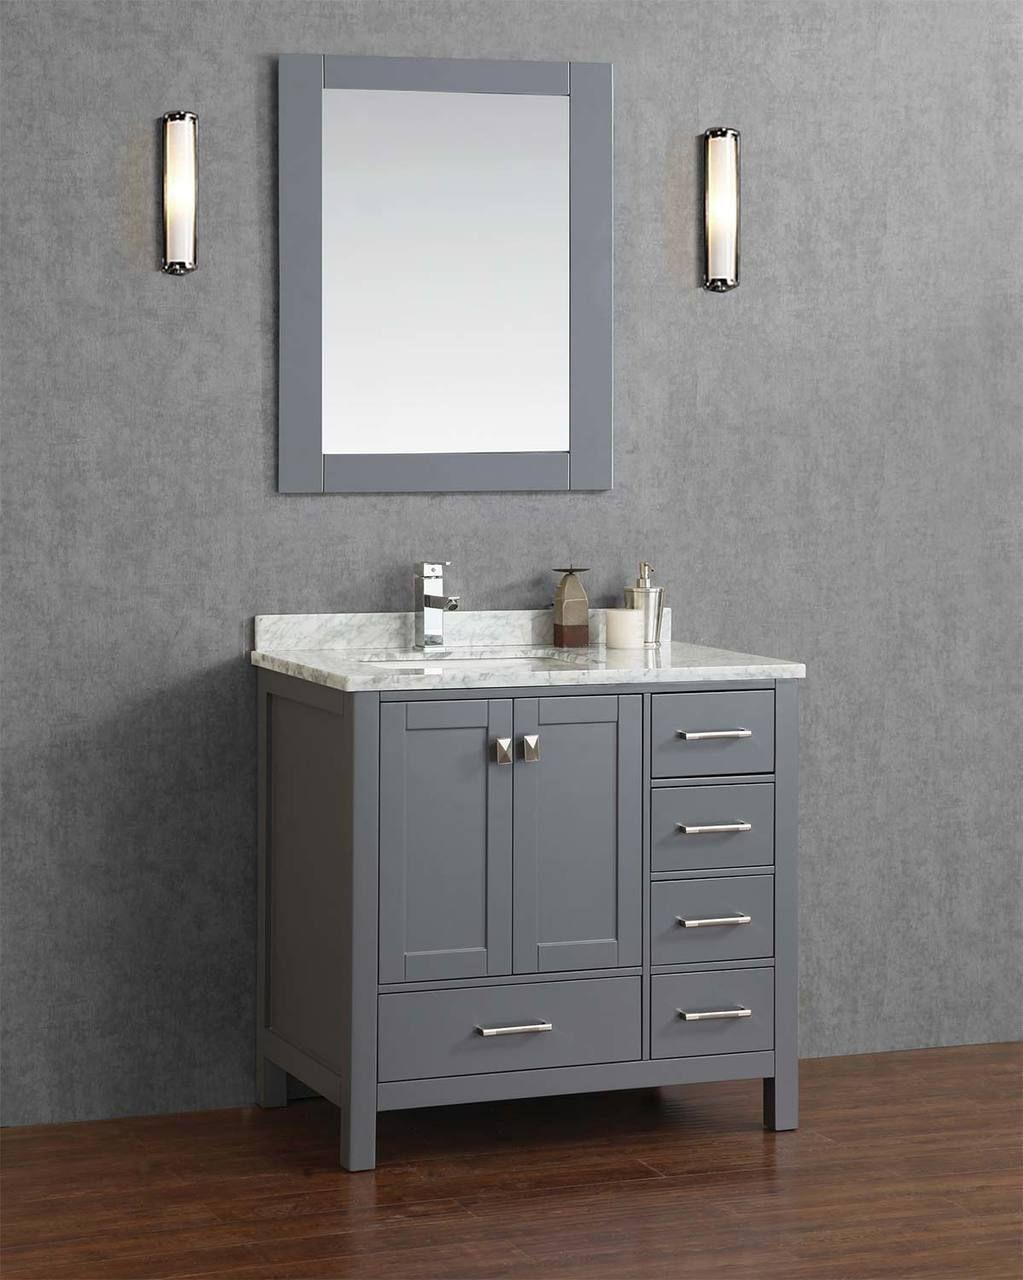 Key West 36 Gray Bathroom Vanity Left Offset 36 Bathroom Vanity Grey Bathroom Vanity Menards Bathroom Vanity